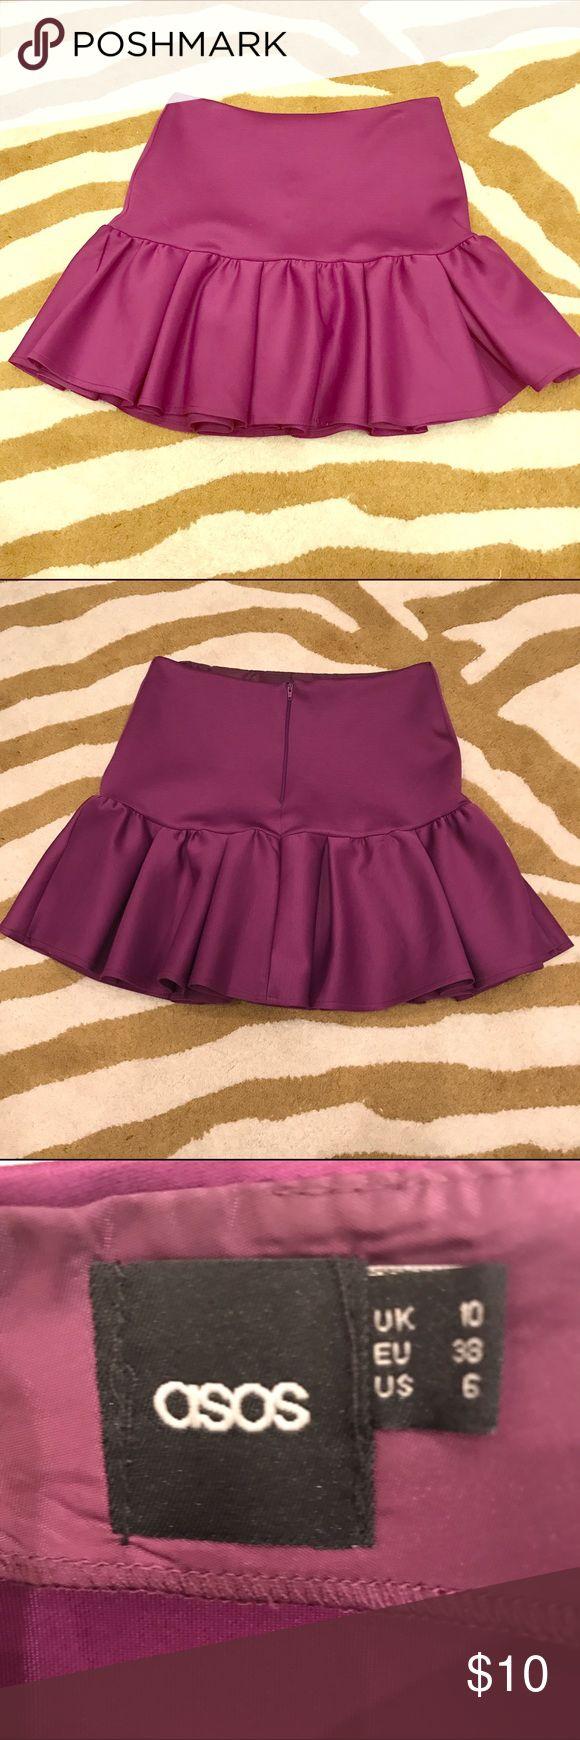 Asos skirt Scuba mini skirt from asos. Great condition. ASOS Skirts Mini